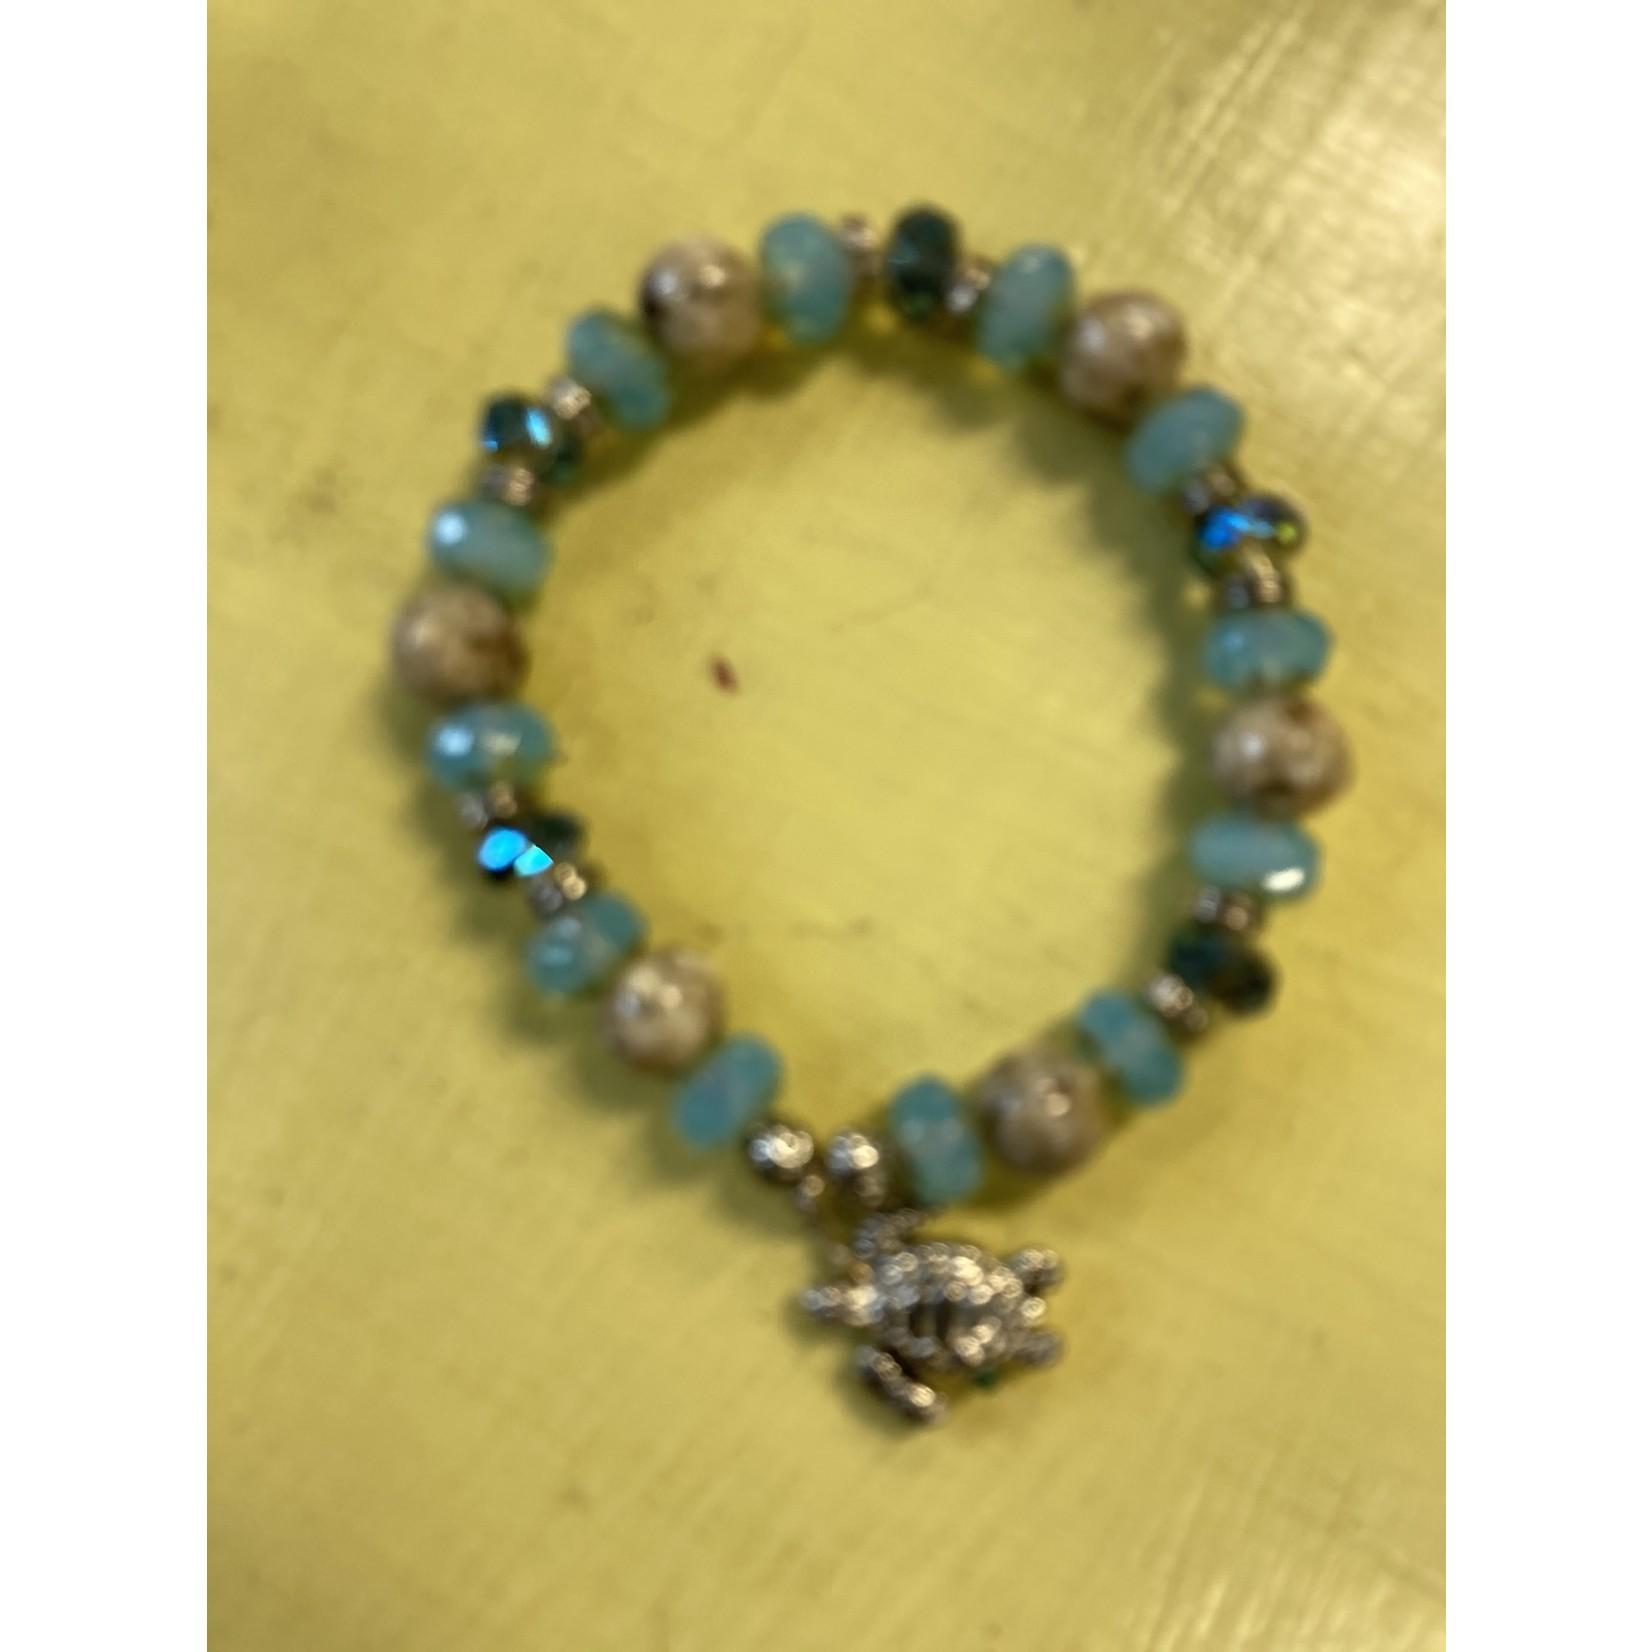 Colleen Hirsh Hirsh #53 sand & bead bracelet w silver turtle